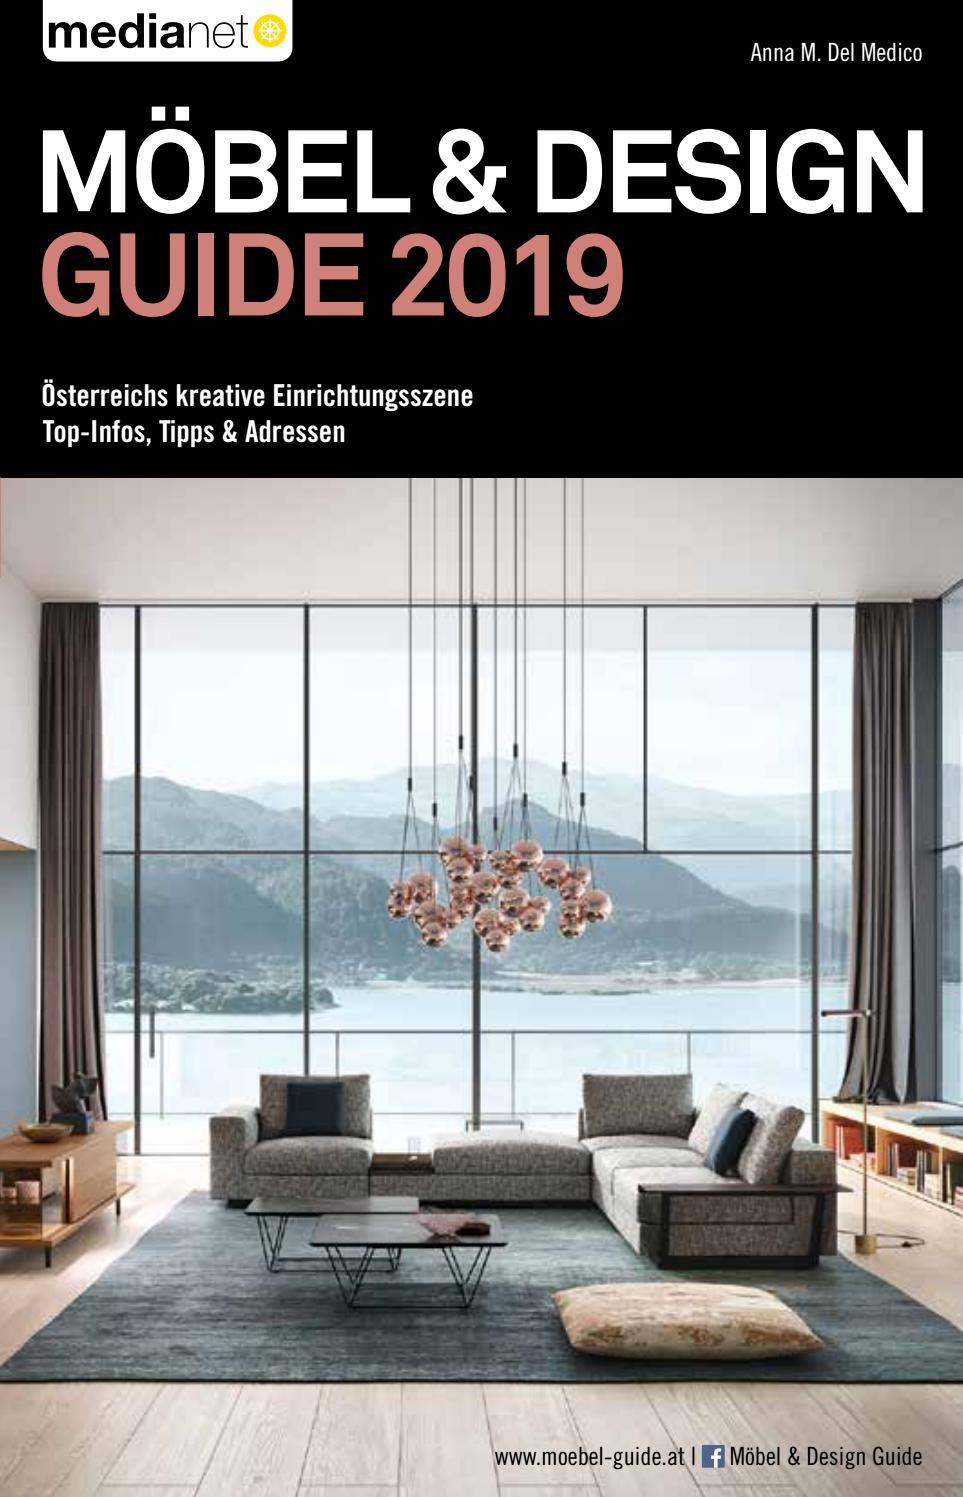 Full Size of Mbel Design Guide 2019 By Medianet Bauhaus Fenster Singleküche Mit Kühlschrank E Geräten Wohnzimmer Singleküche Bauhaus